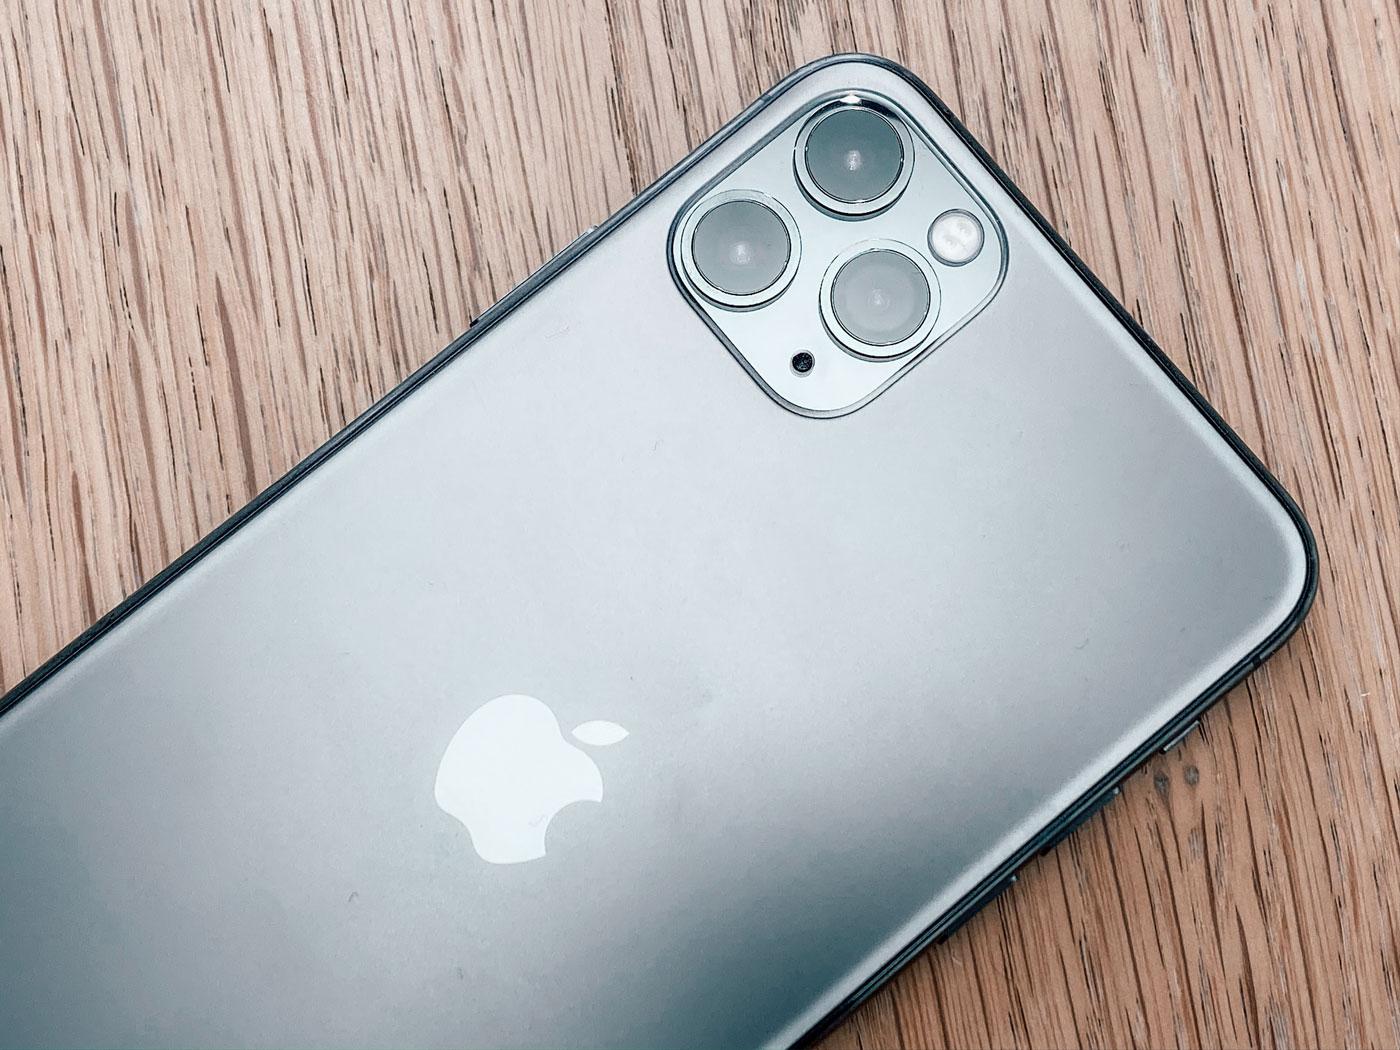 😐 iPhone 12 za $400 — vyznačyly sobivartisť smartfona